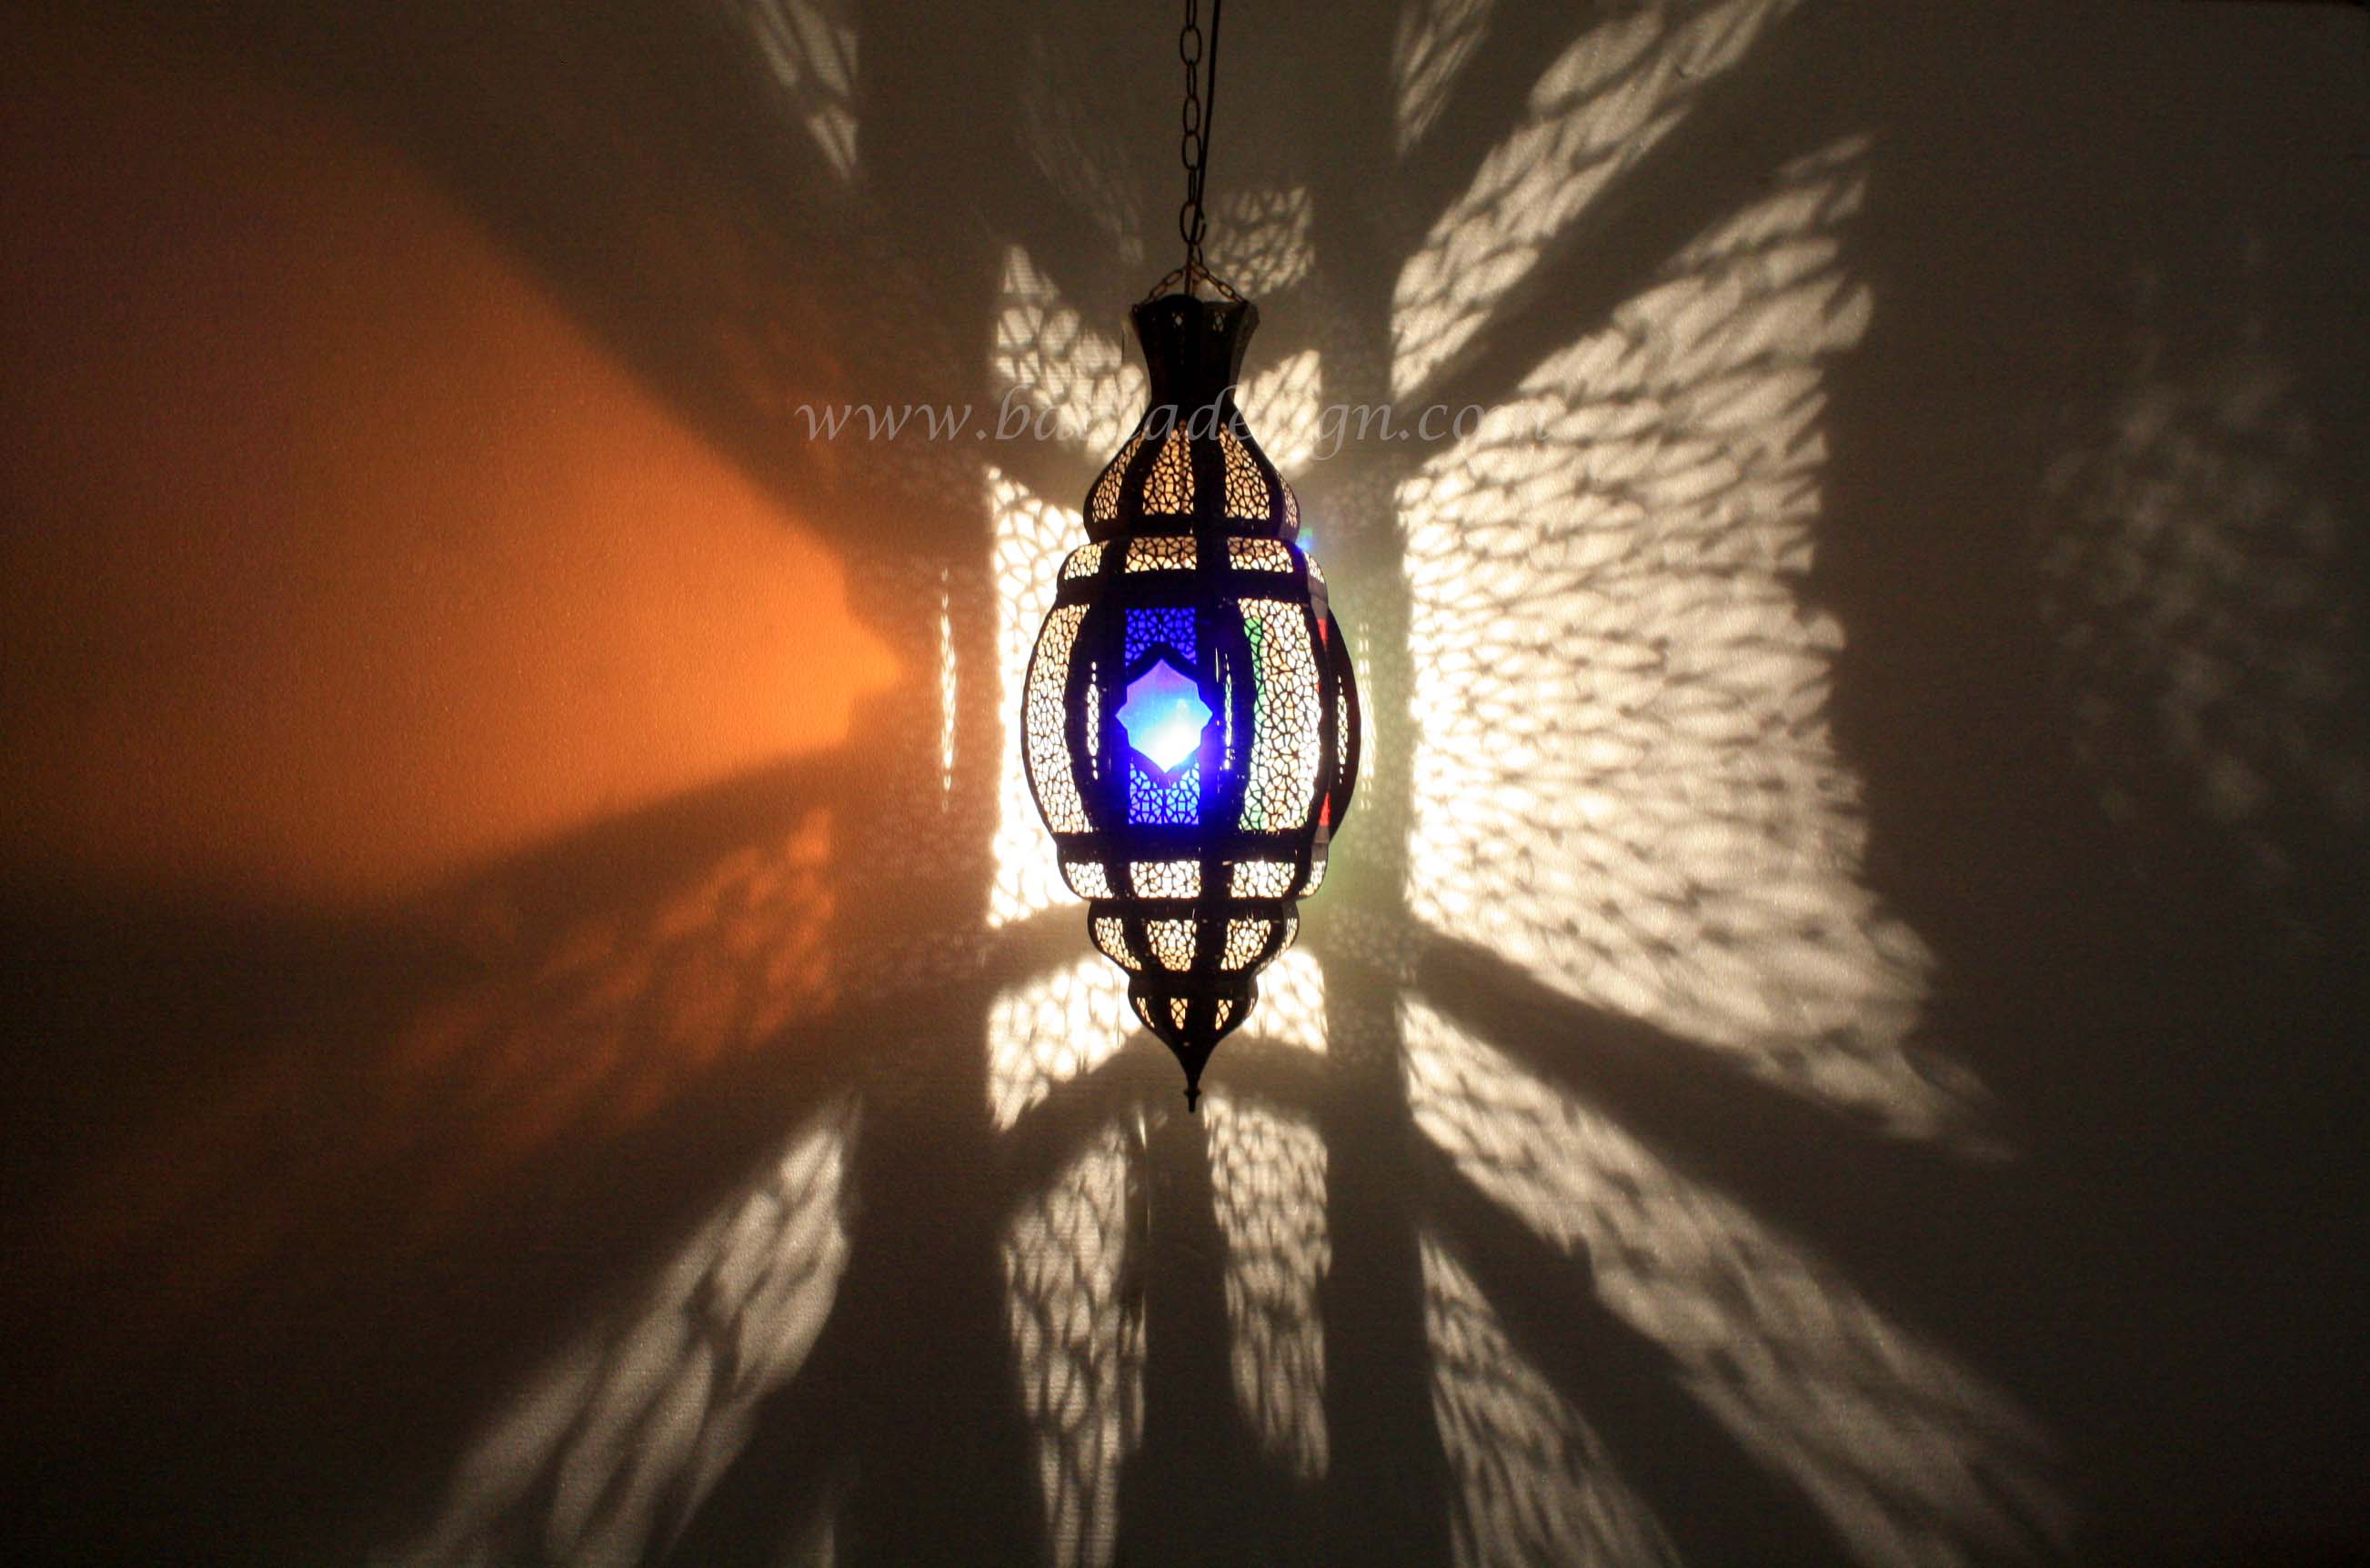 moroccan-multi-color-glass-lantern-lig246-1.jpg